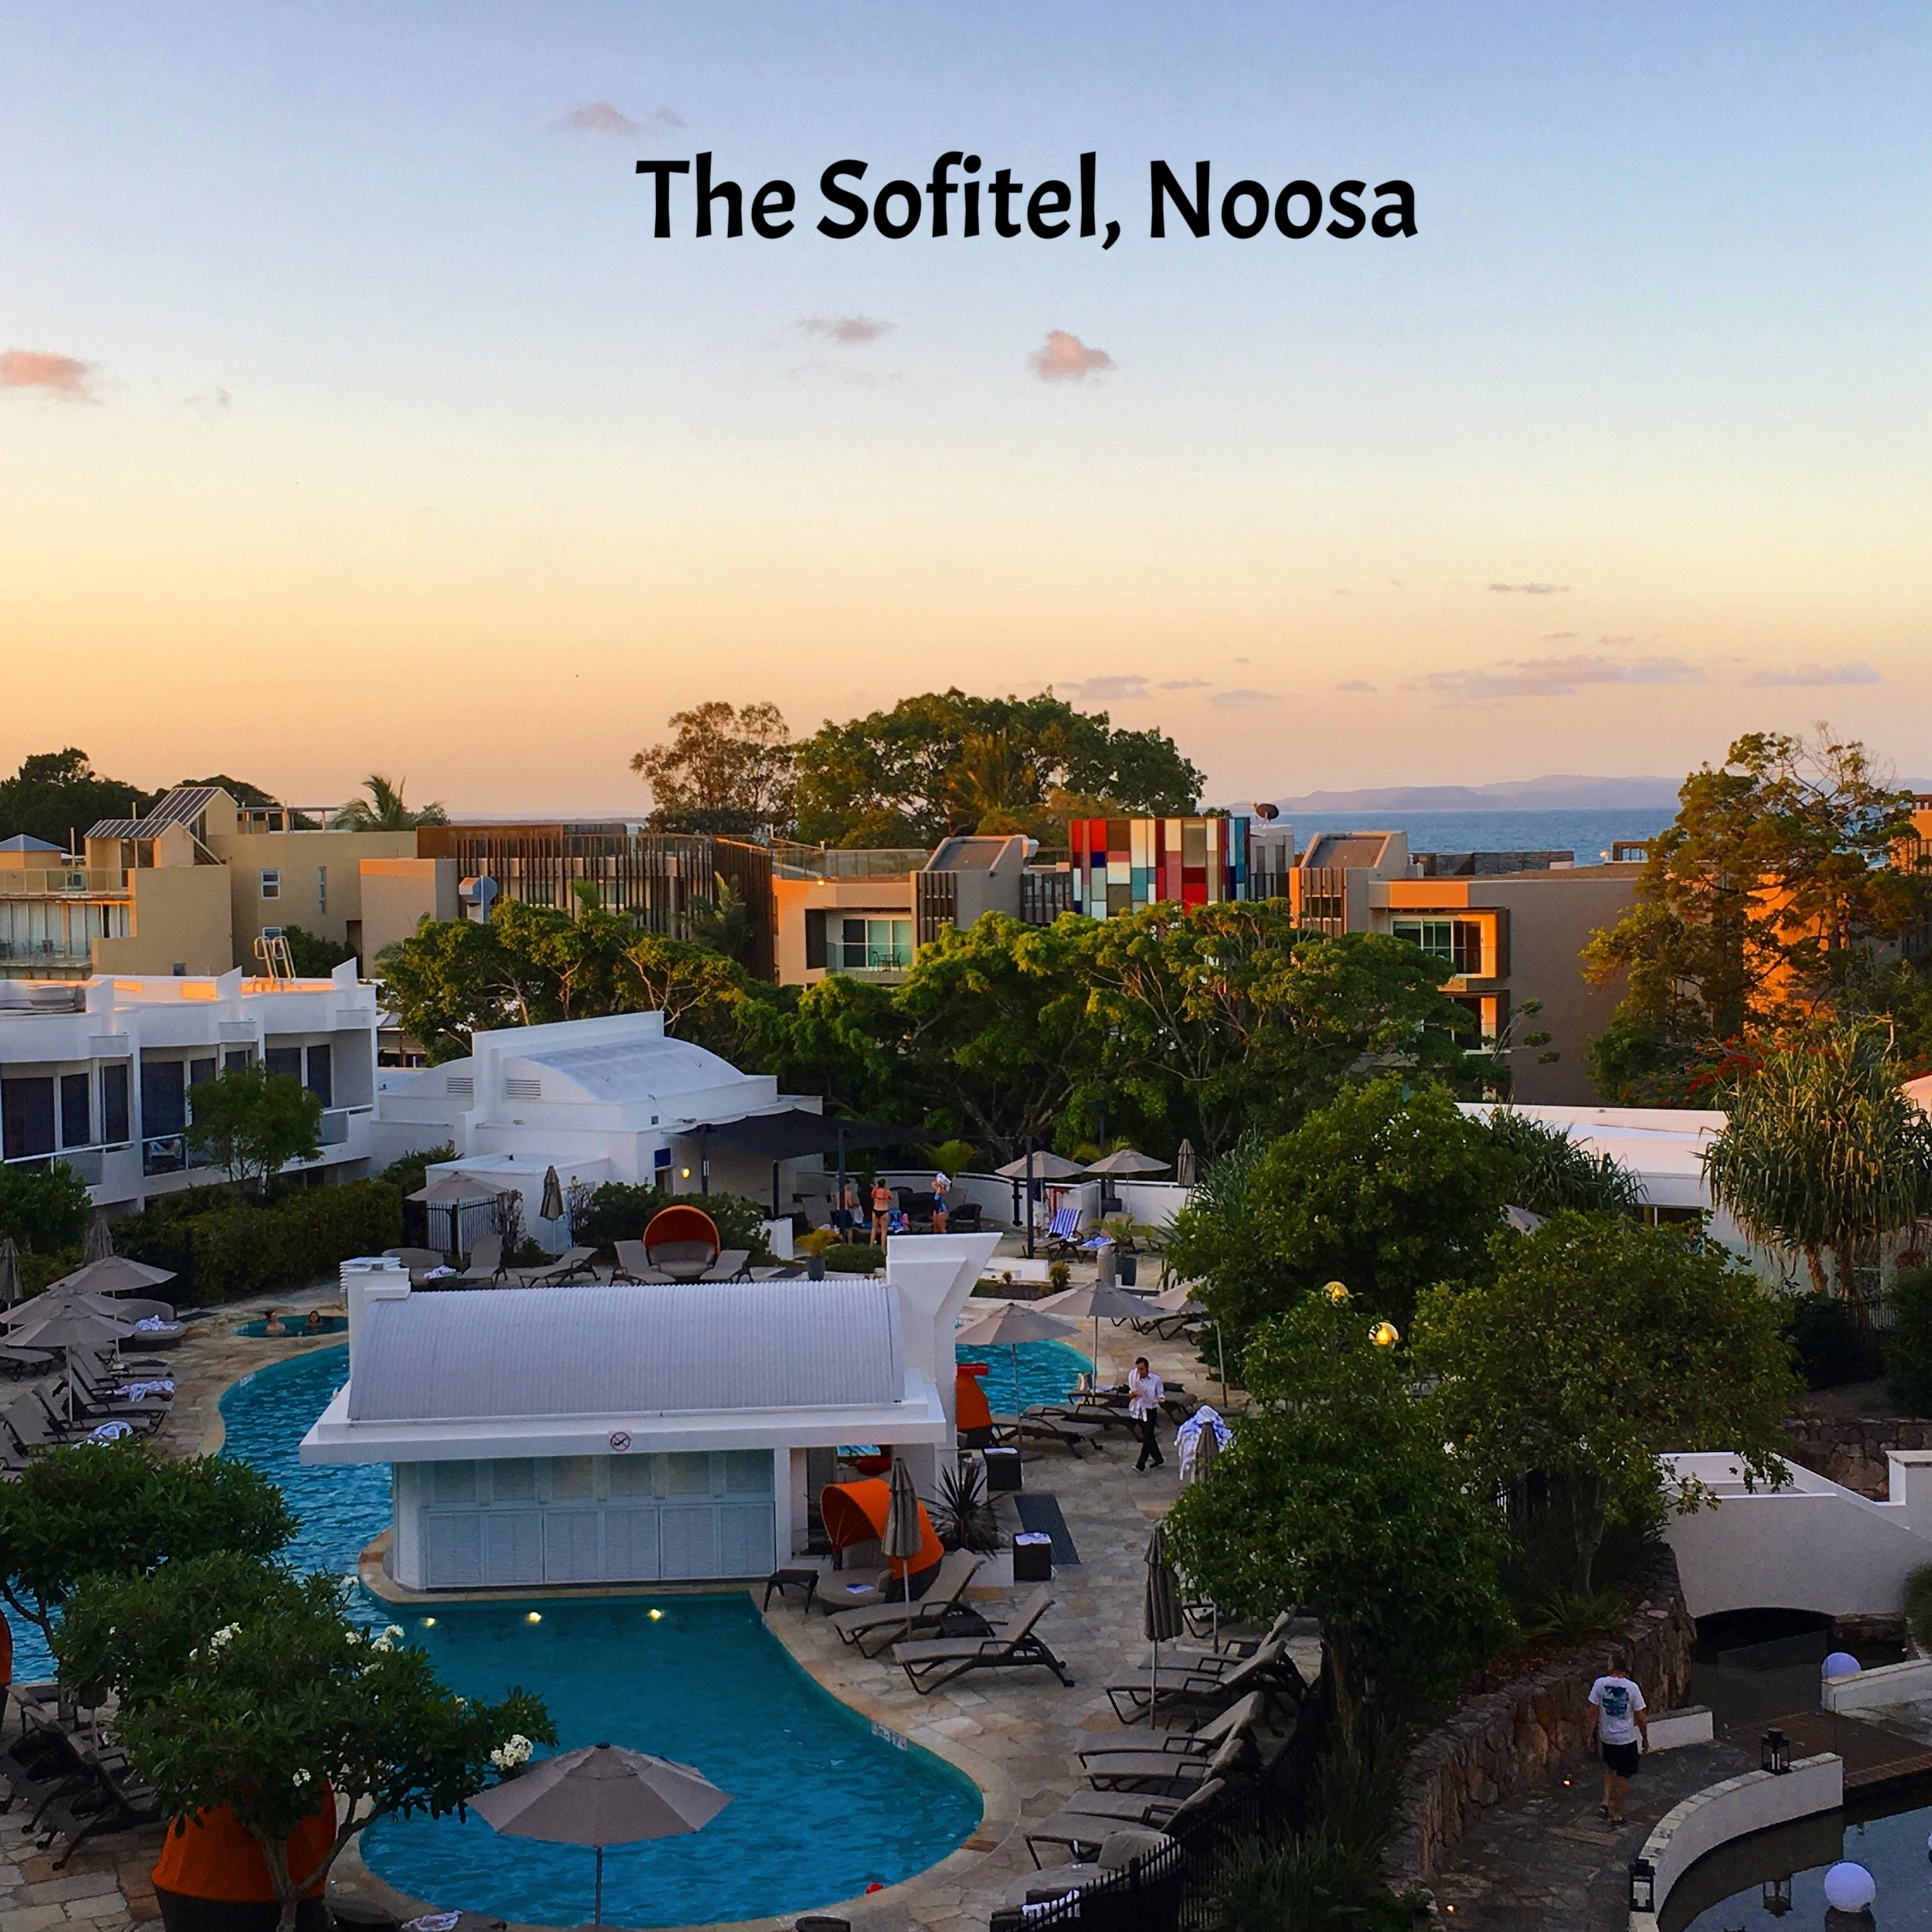 The Sofitel